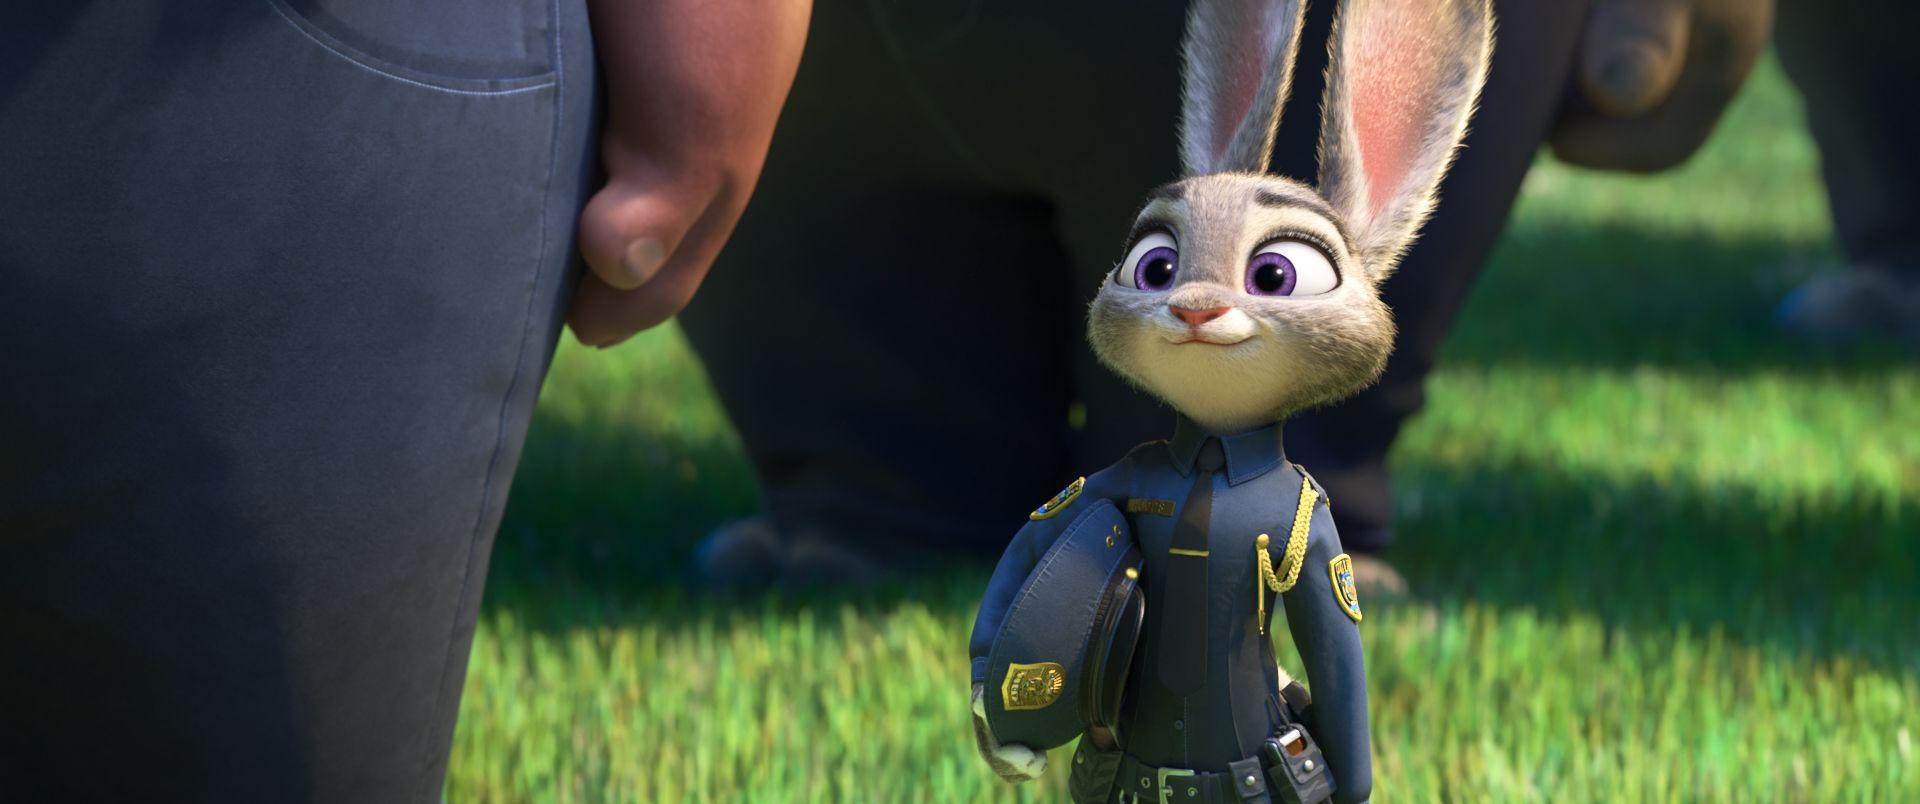 Ausmalbild Nick Und Judy Hopps Aus Zootopia: Zootopia Documentary Reveals Disney Movie's Evolution